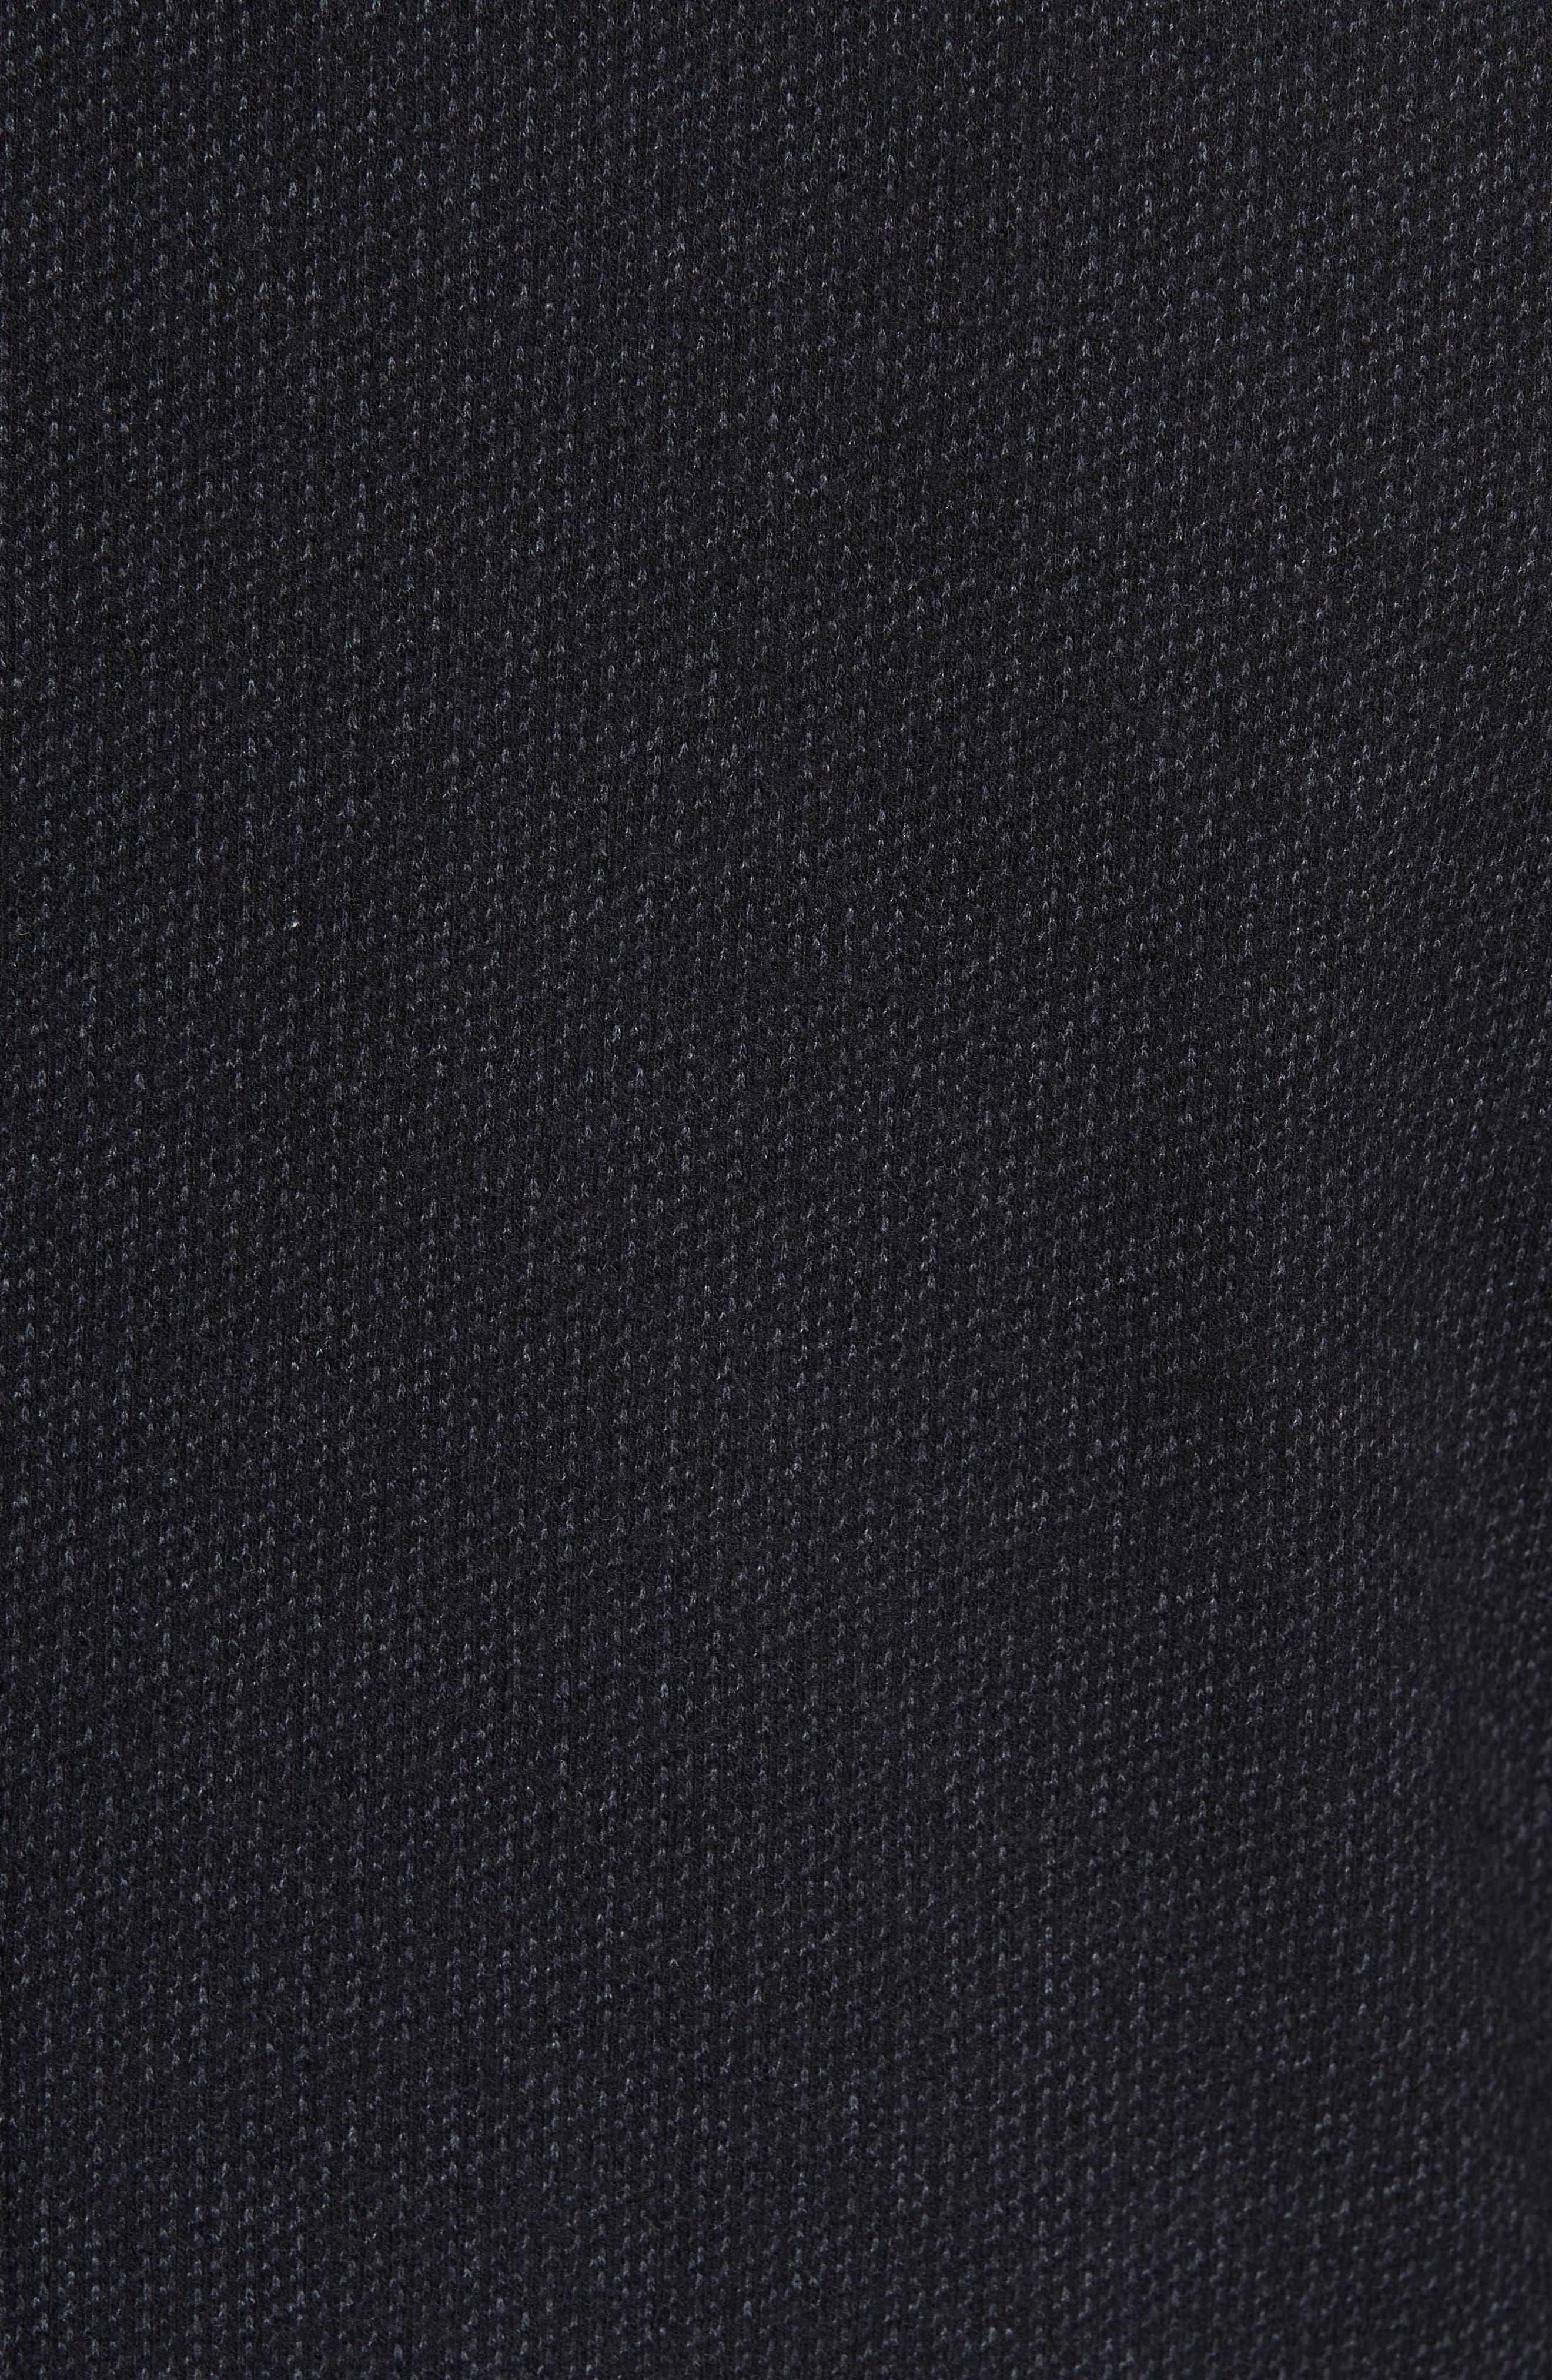 Slim Fit Wool & Cotton Blazer,                             Alternate thumbnail 3, color,                             Grey